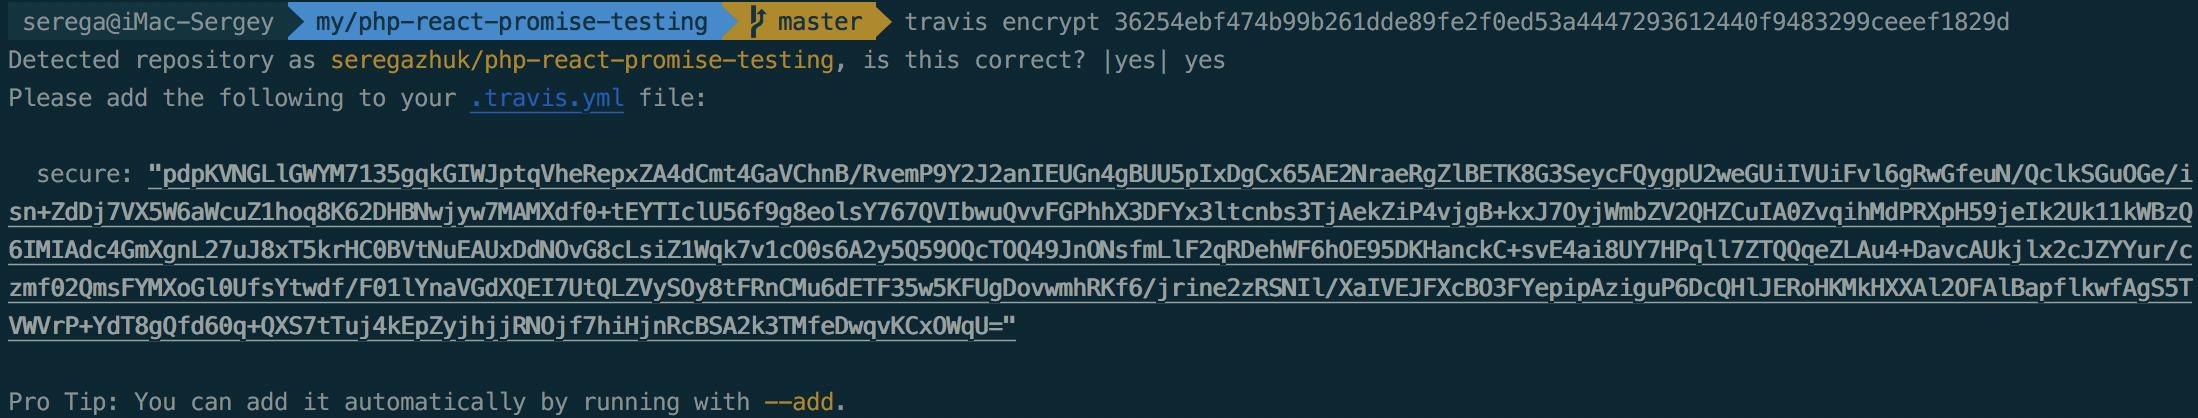 travis-encrypt